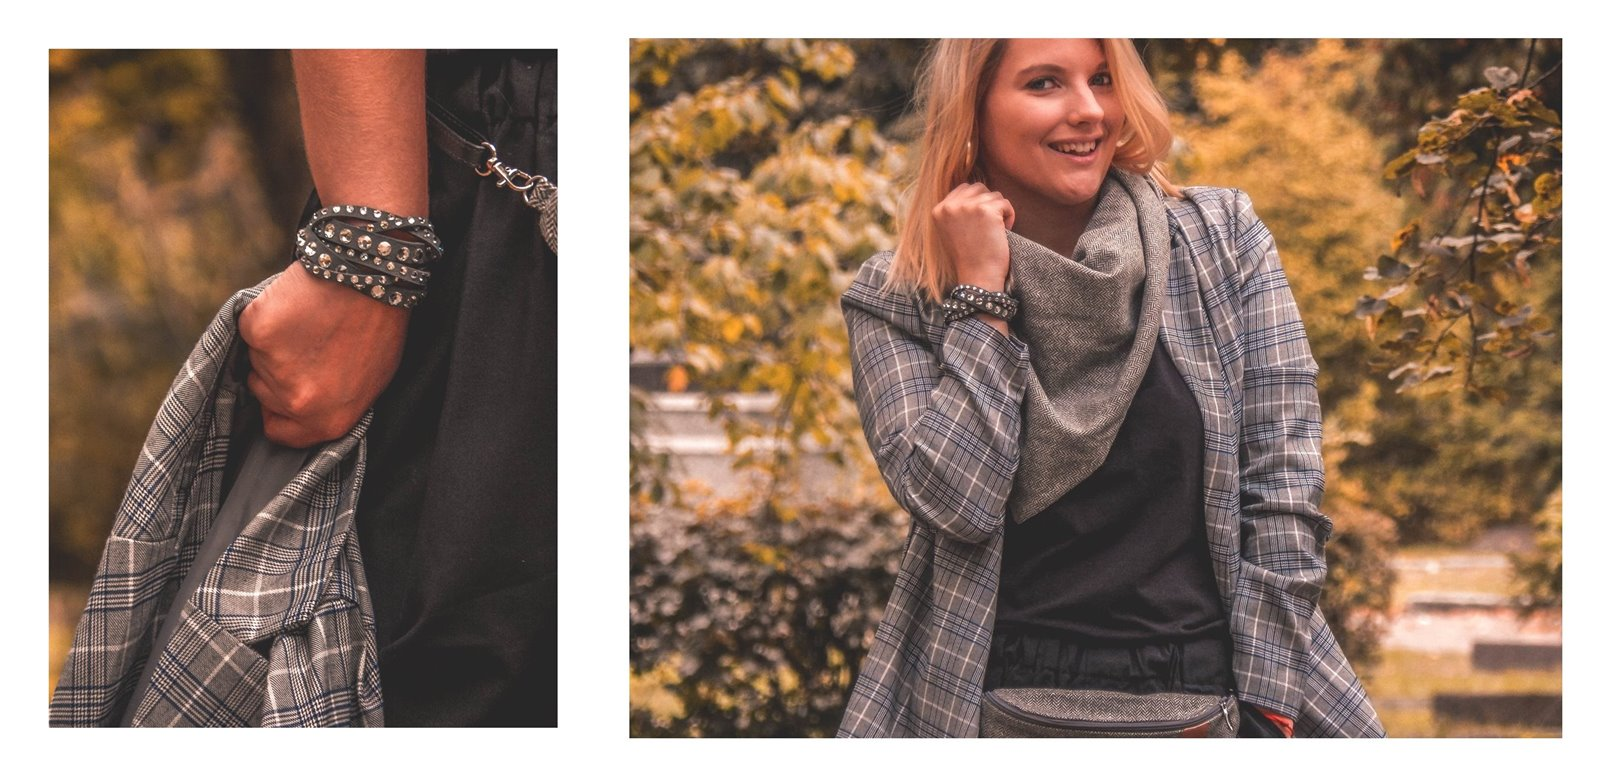 współpraca marka bloger stylizacja cado nerka komin na jesień szara marynarka nakd zniżka cena promocja blondynka selfieroom moda damska blog vansy kuloty jak nosić modna polka łódź lifestyle